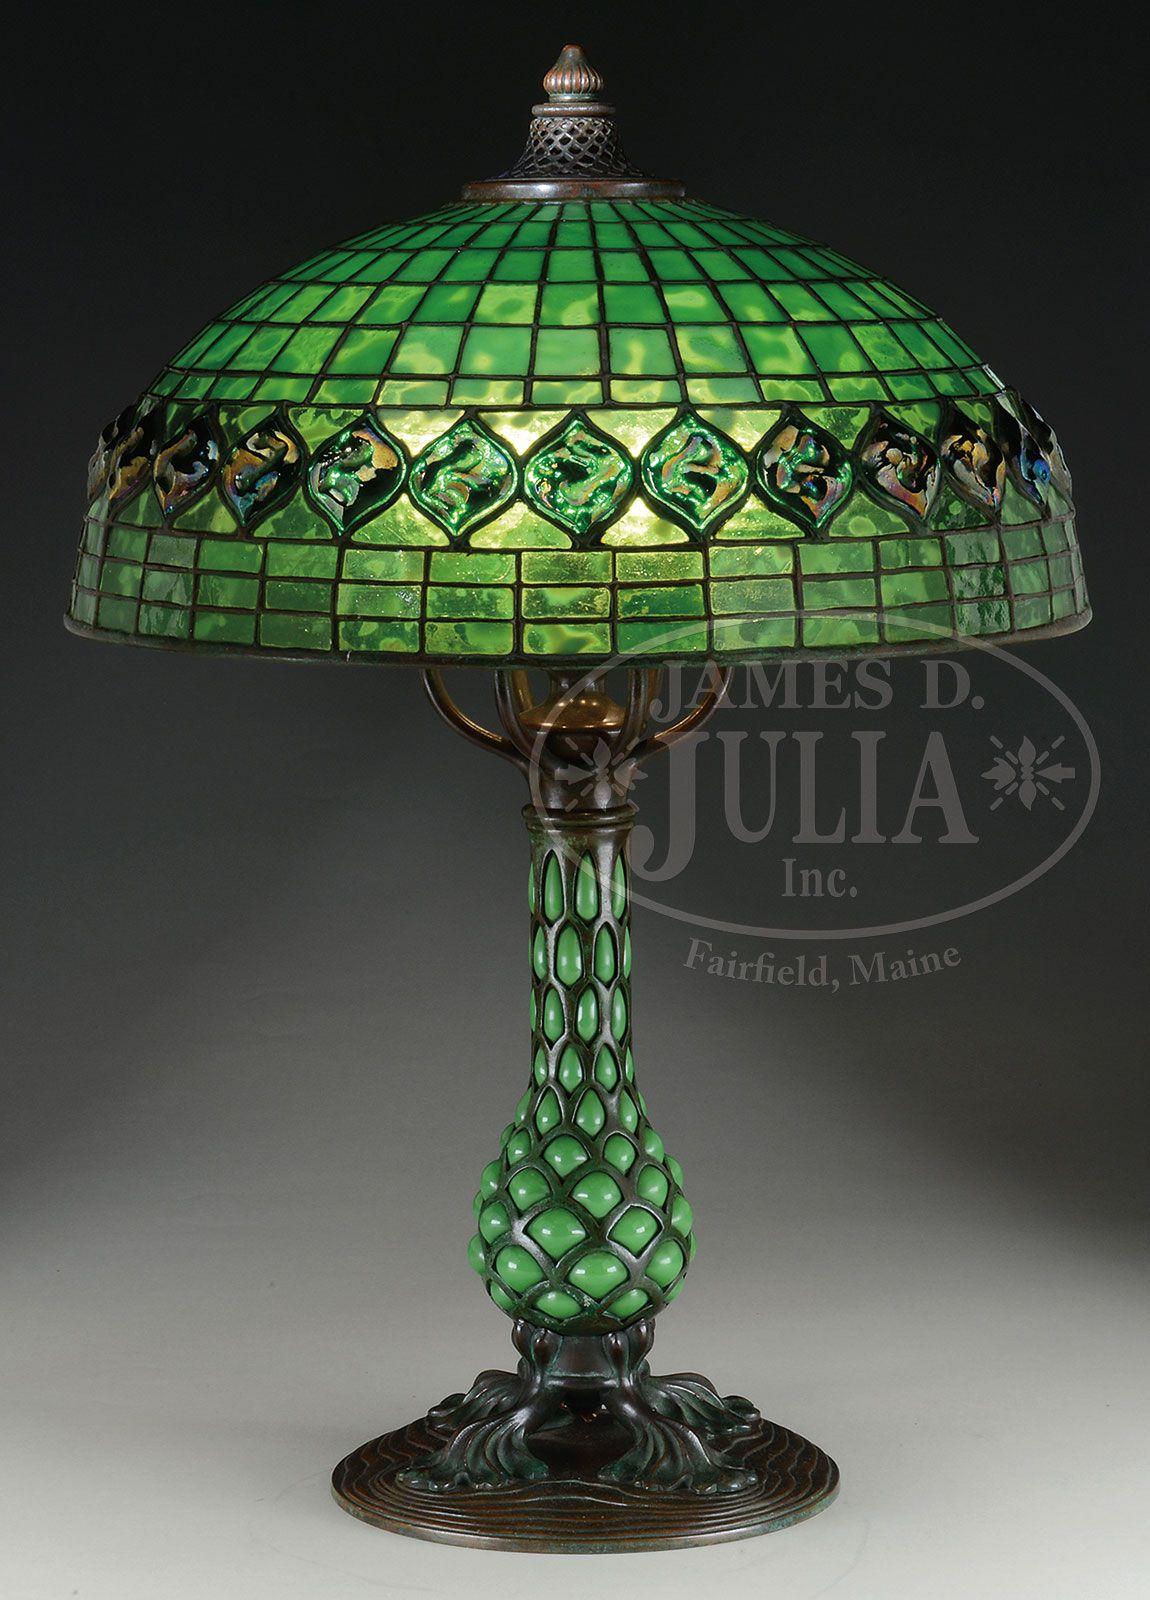 Tiffany studios turtleback on bloen out pineapple base vintage interior pinterest lampes - Meuble tiffany ...